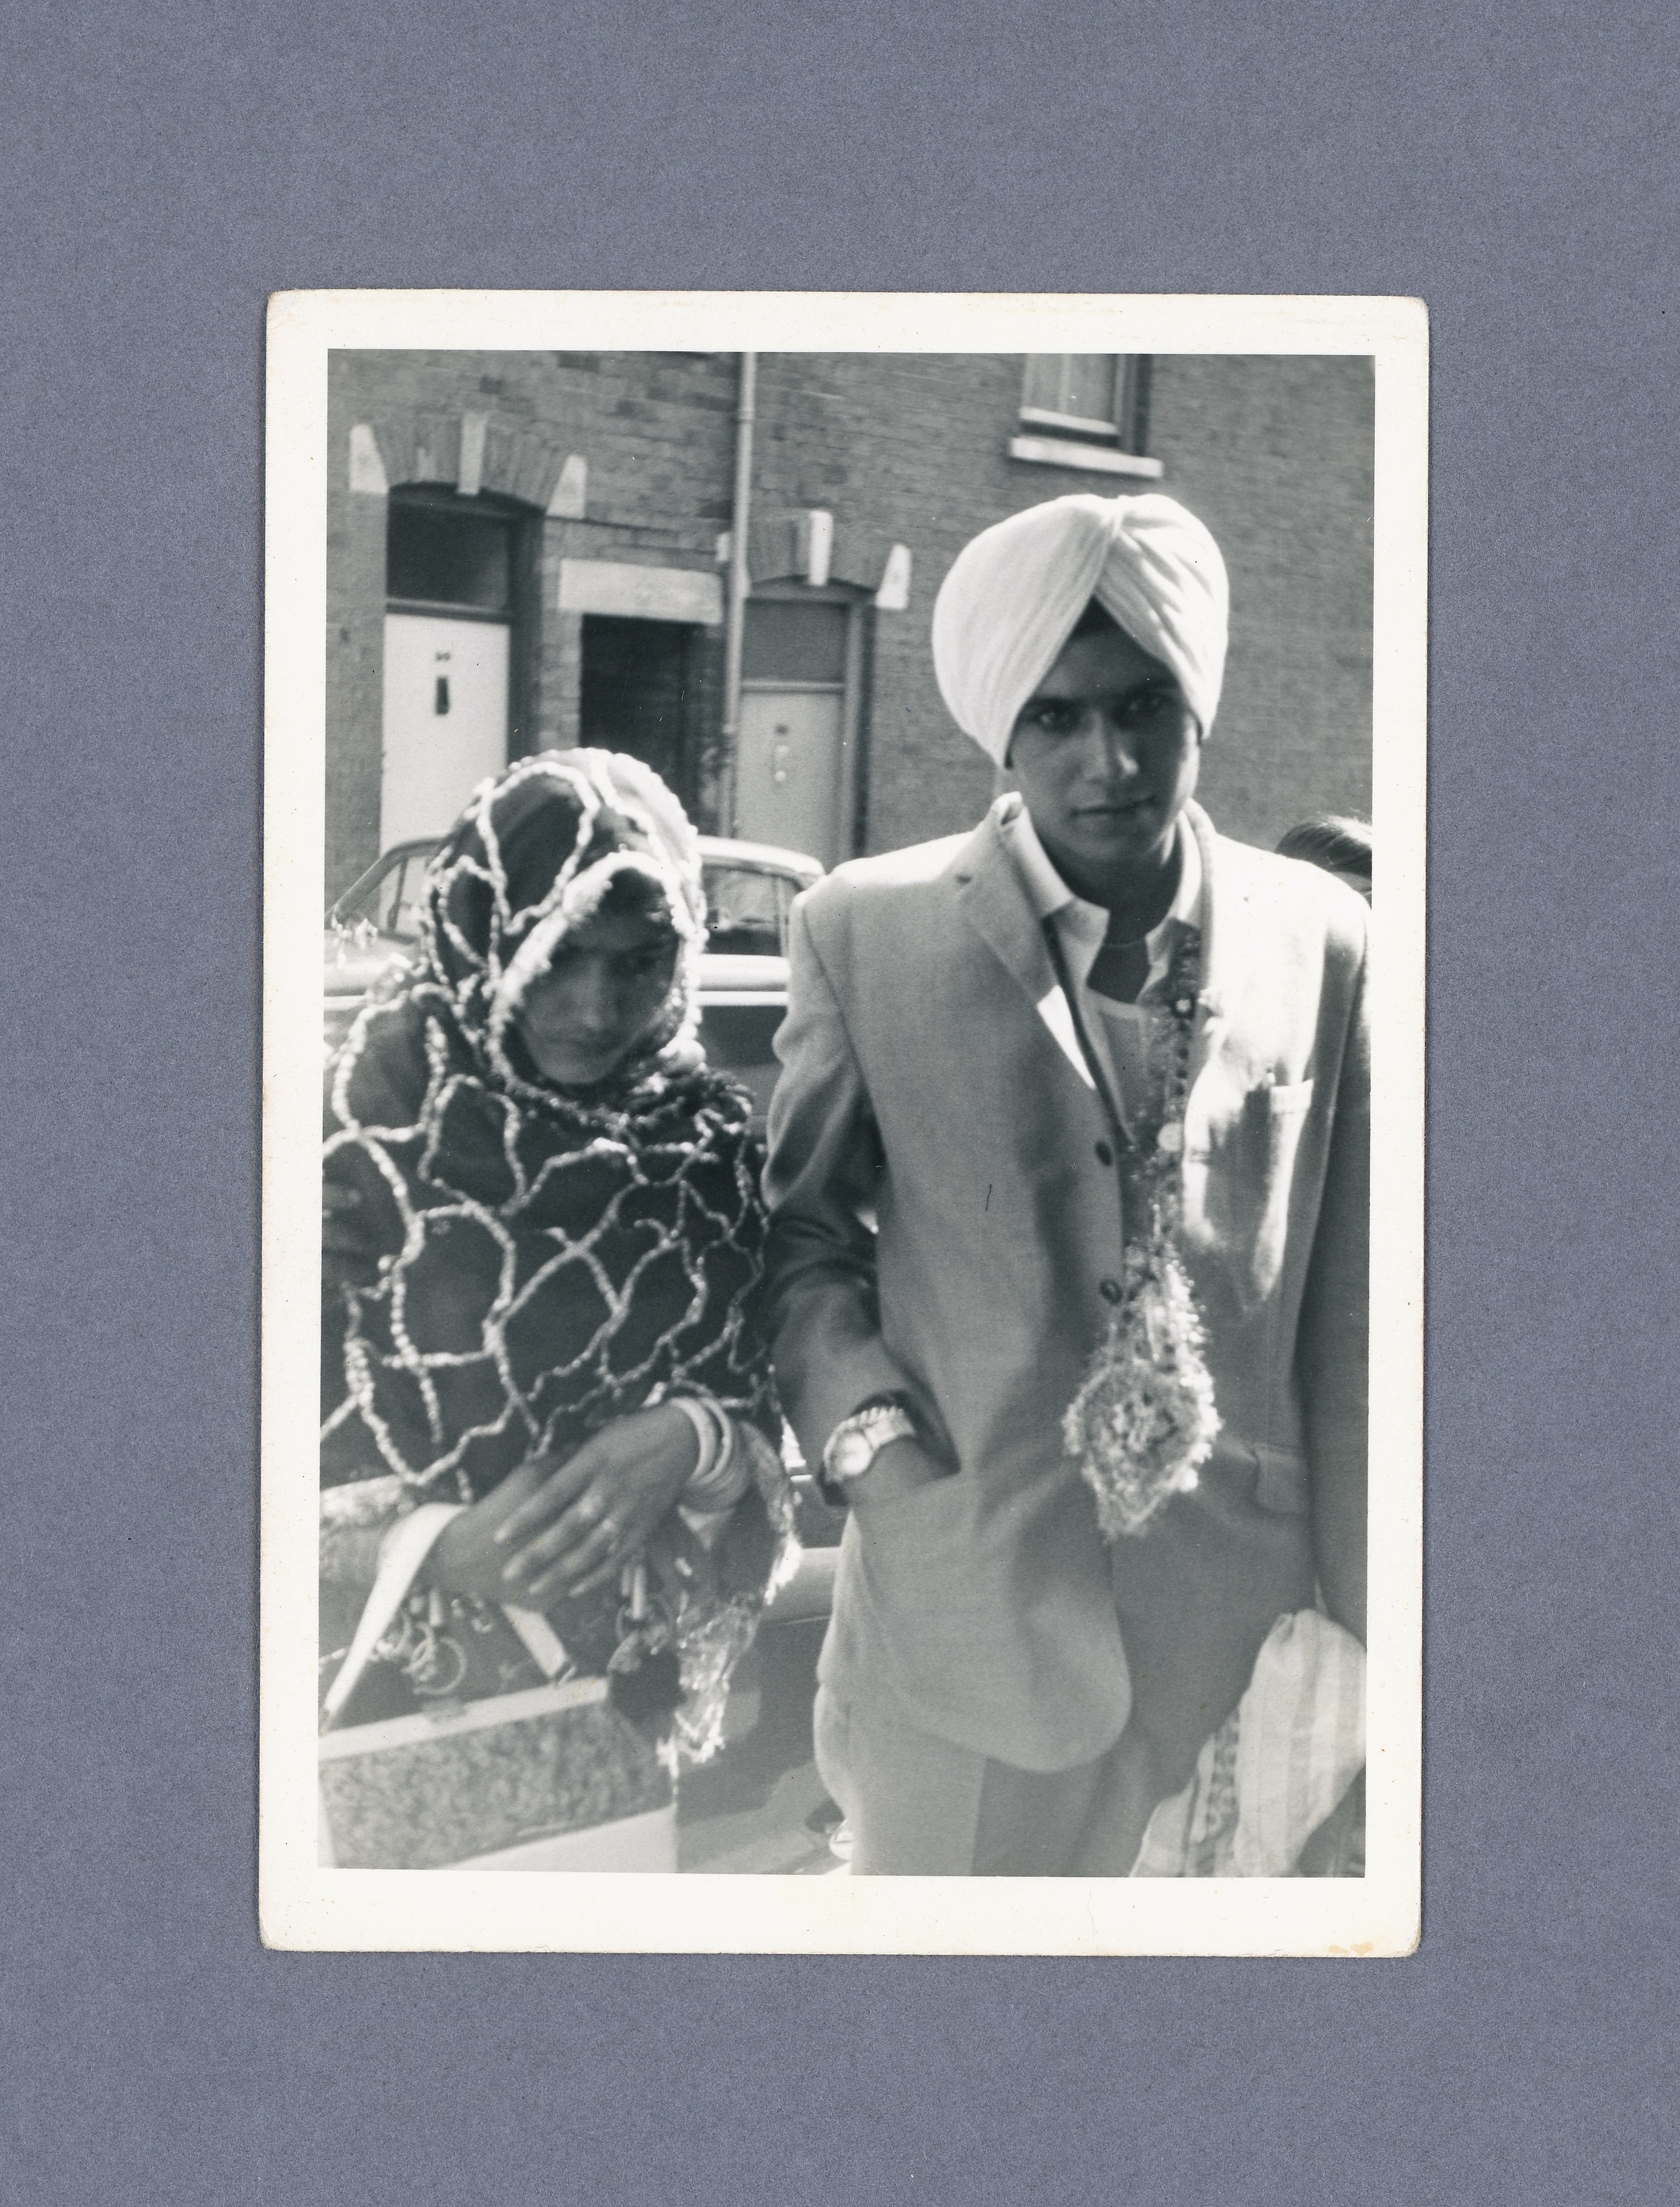 Redcross St. c.1969